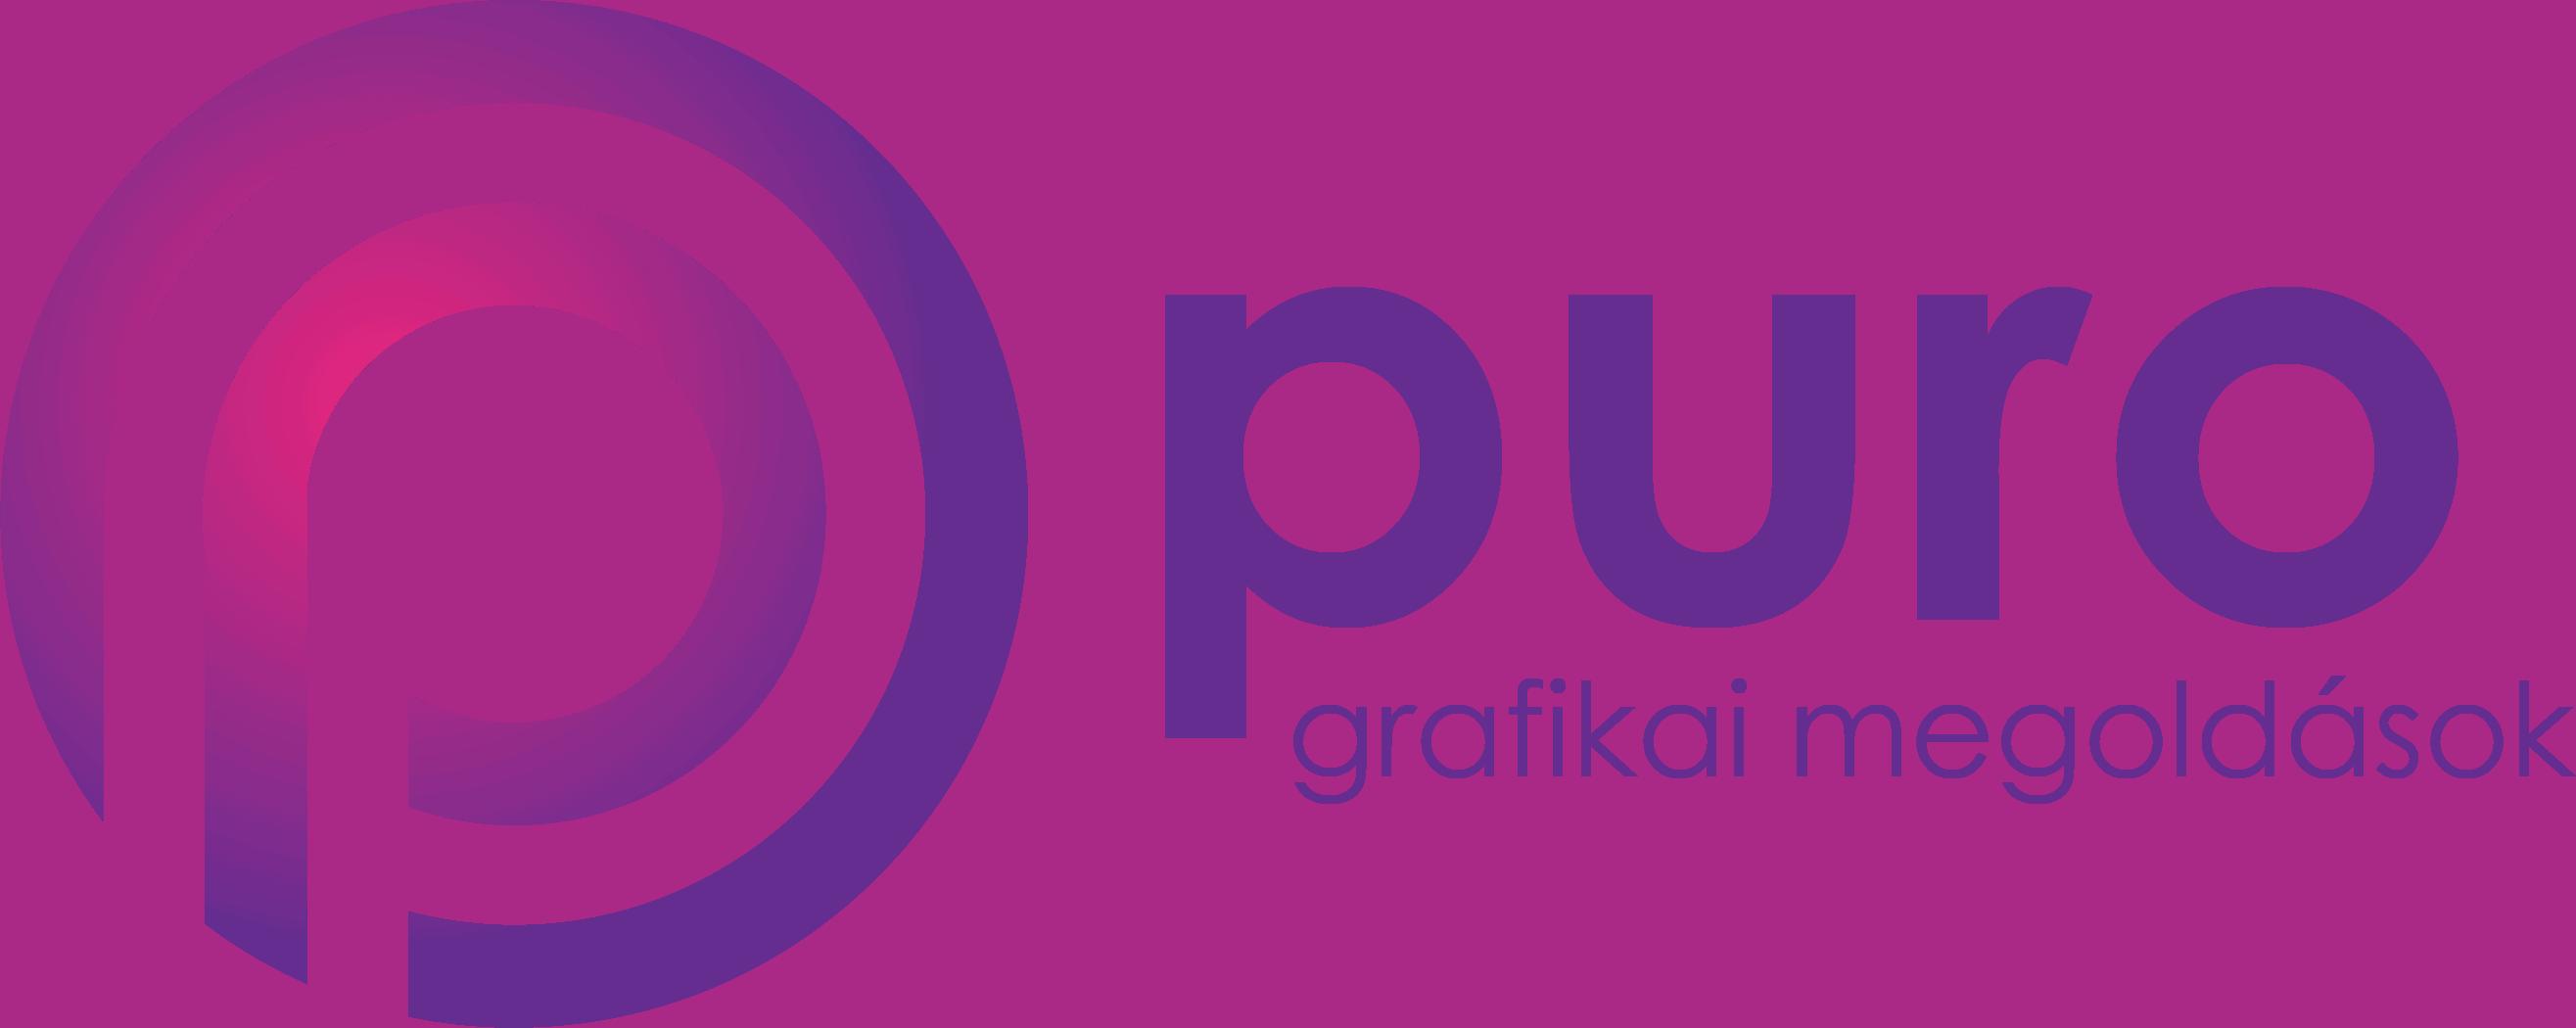 Puro Grafikai Megoldások